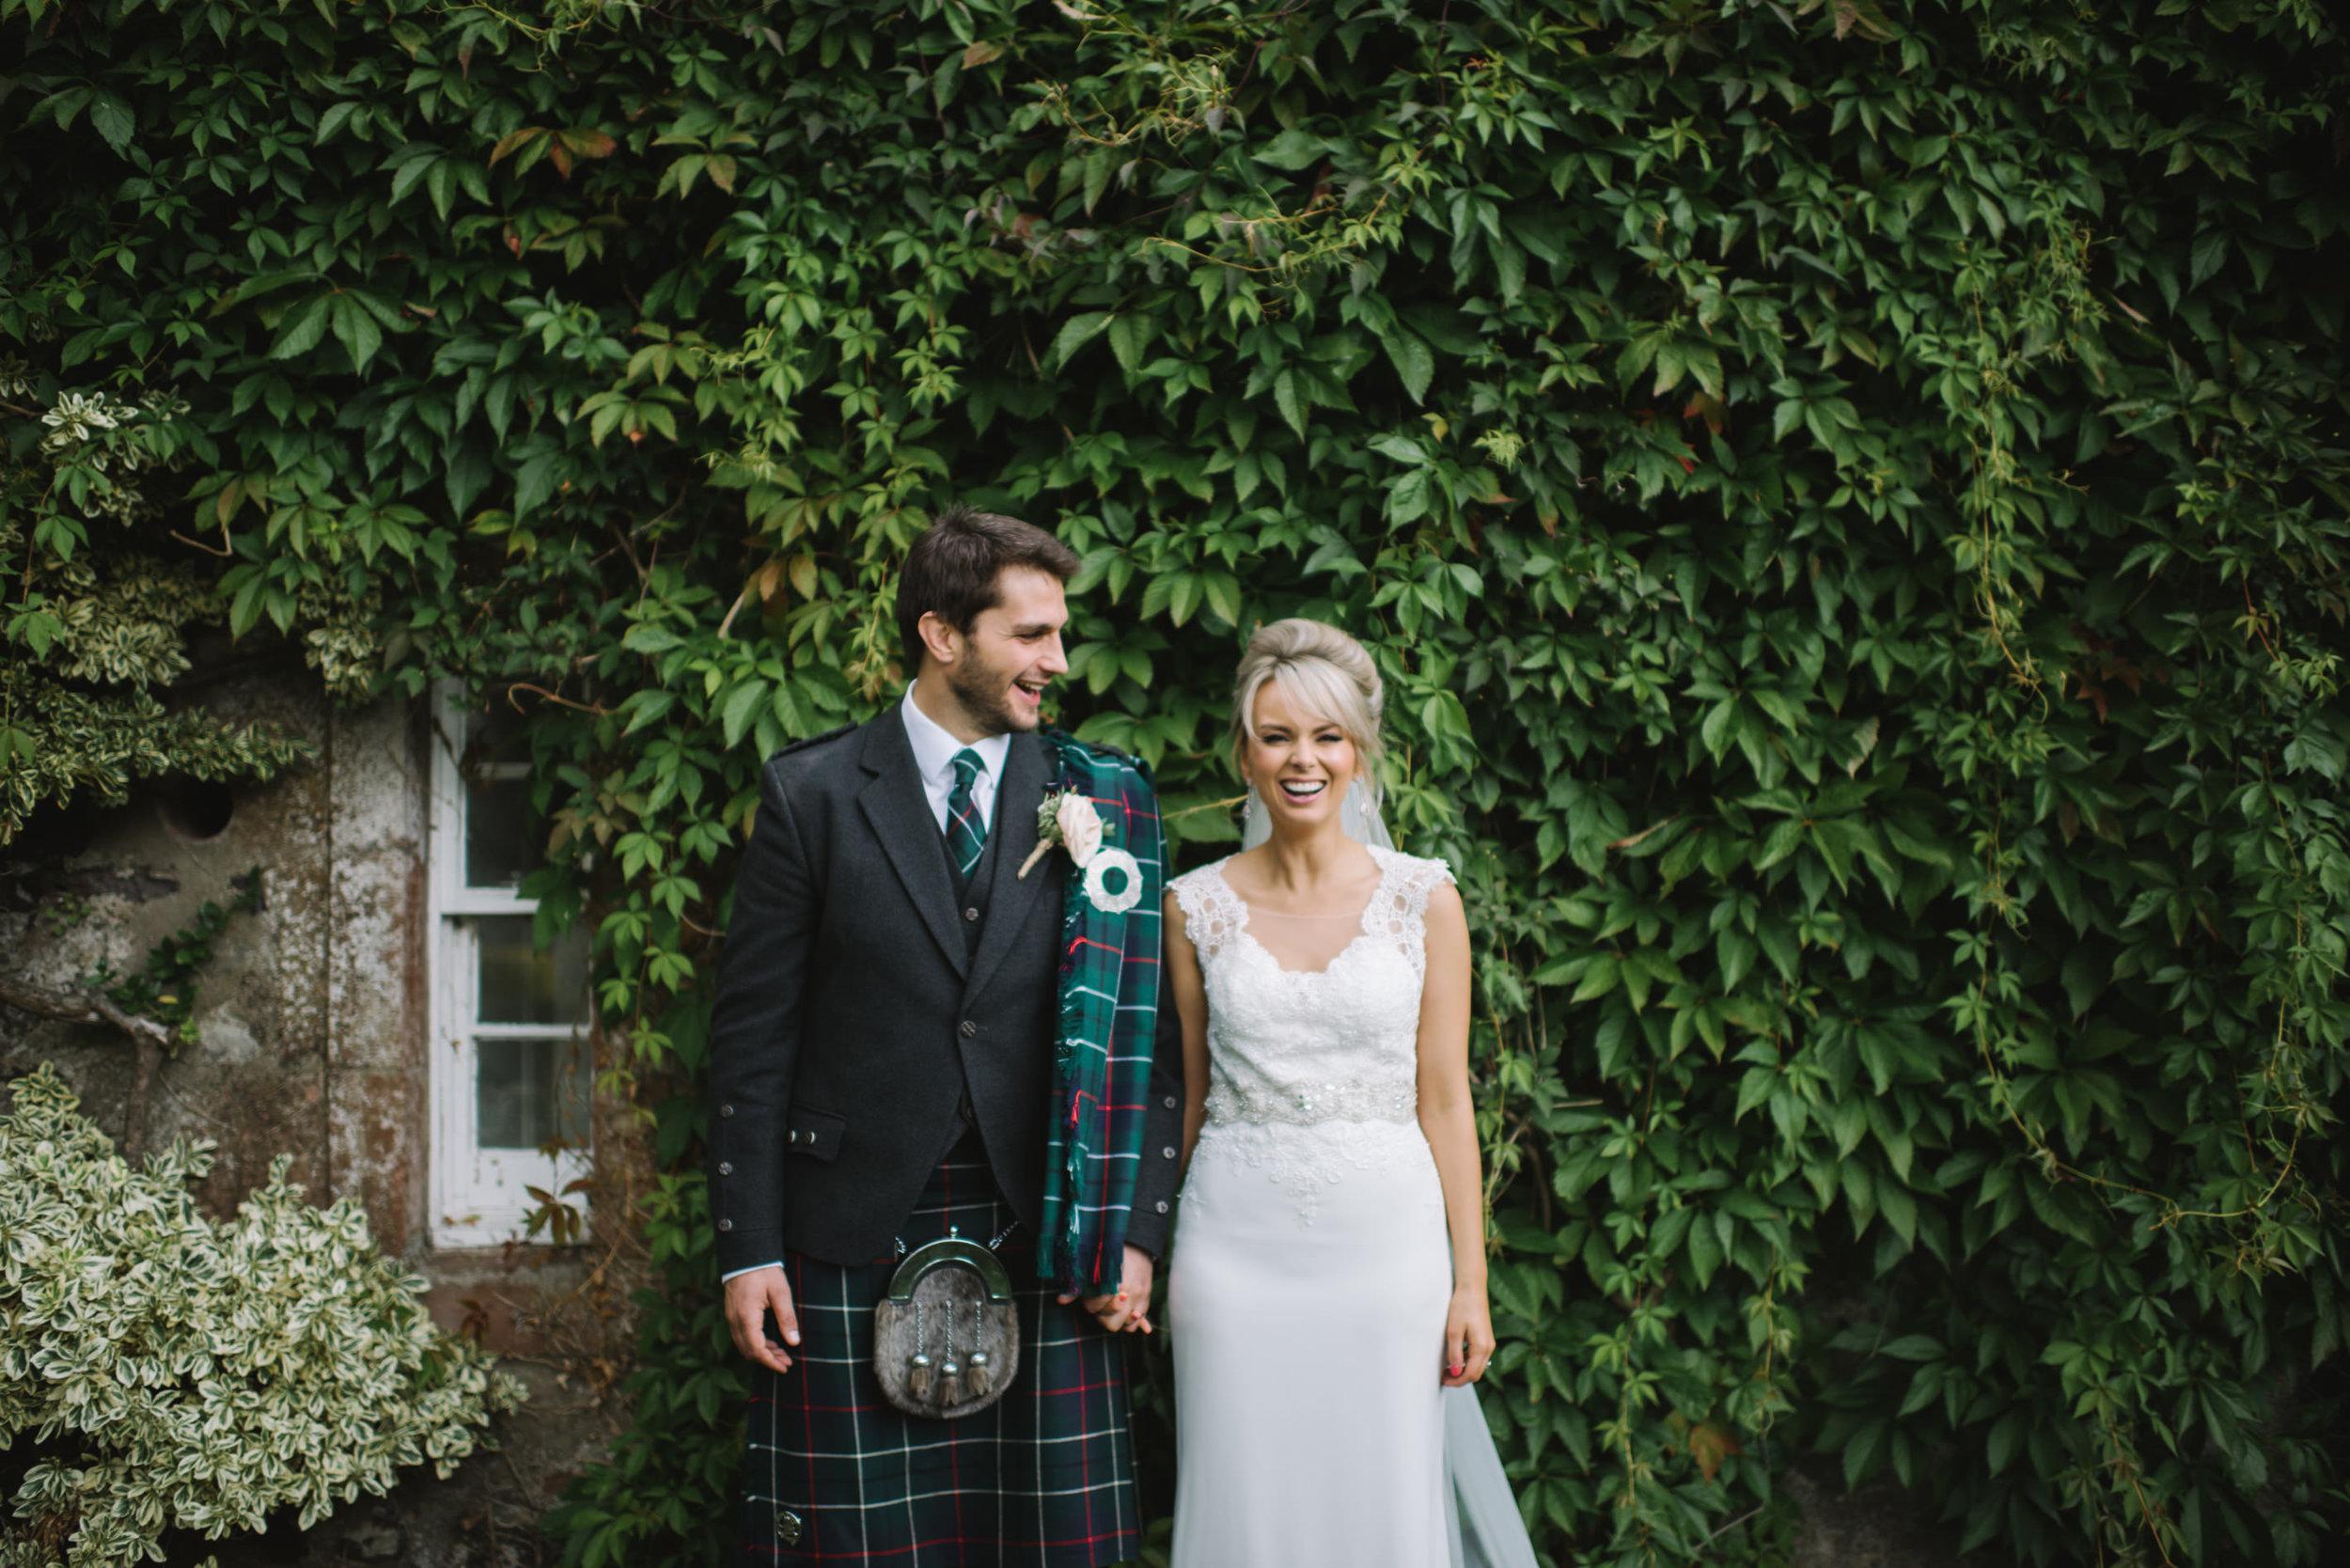 0189-alternative-wedding-portrait-family-kids-photographer-glasgow-scotland.JPG